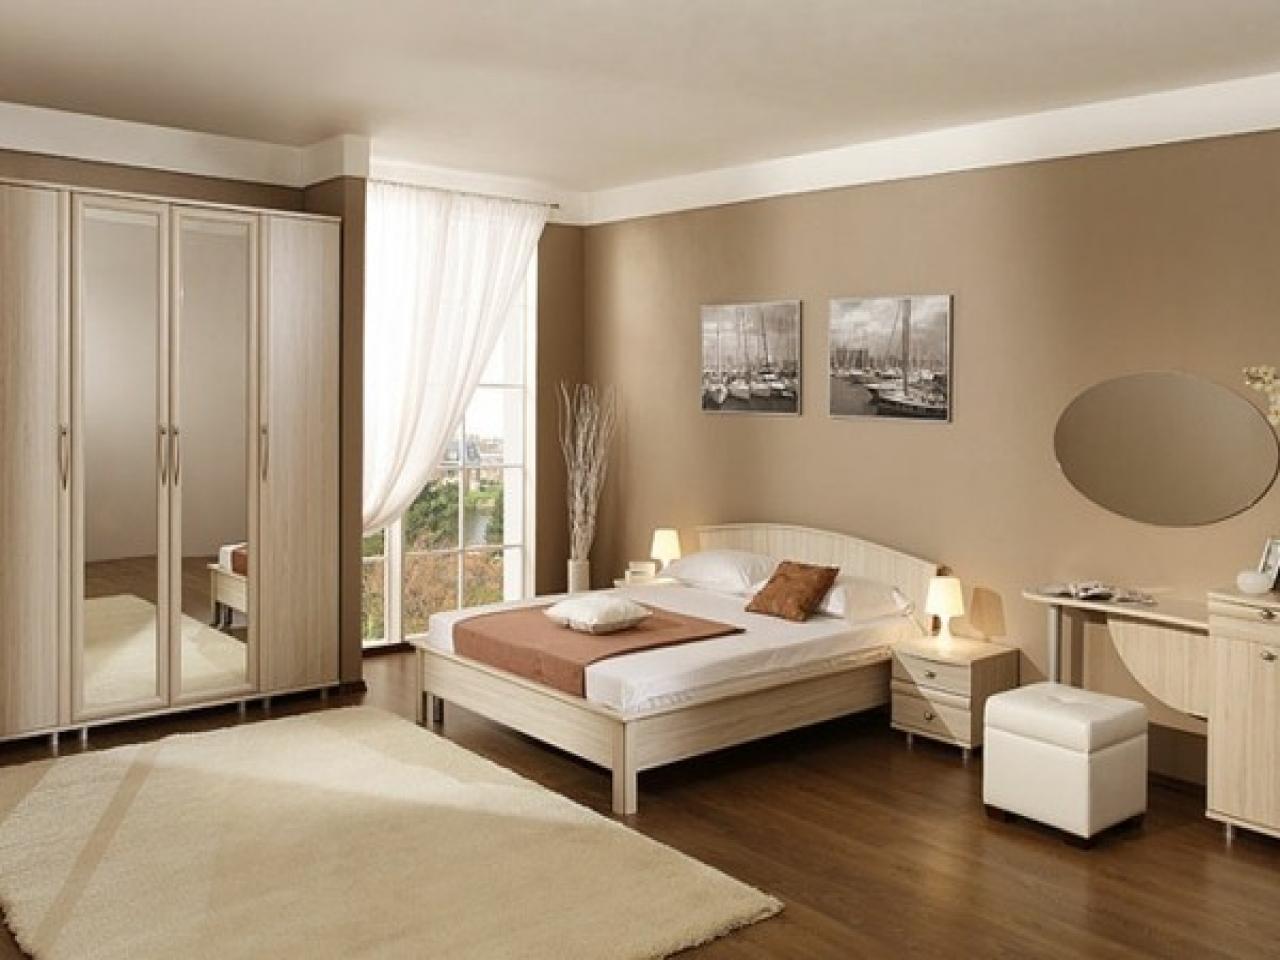 sleeping room with den ideas